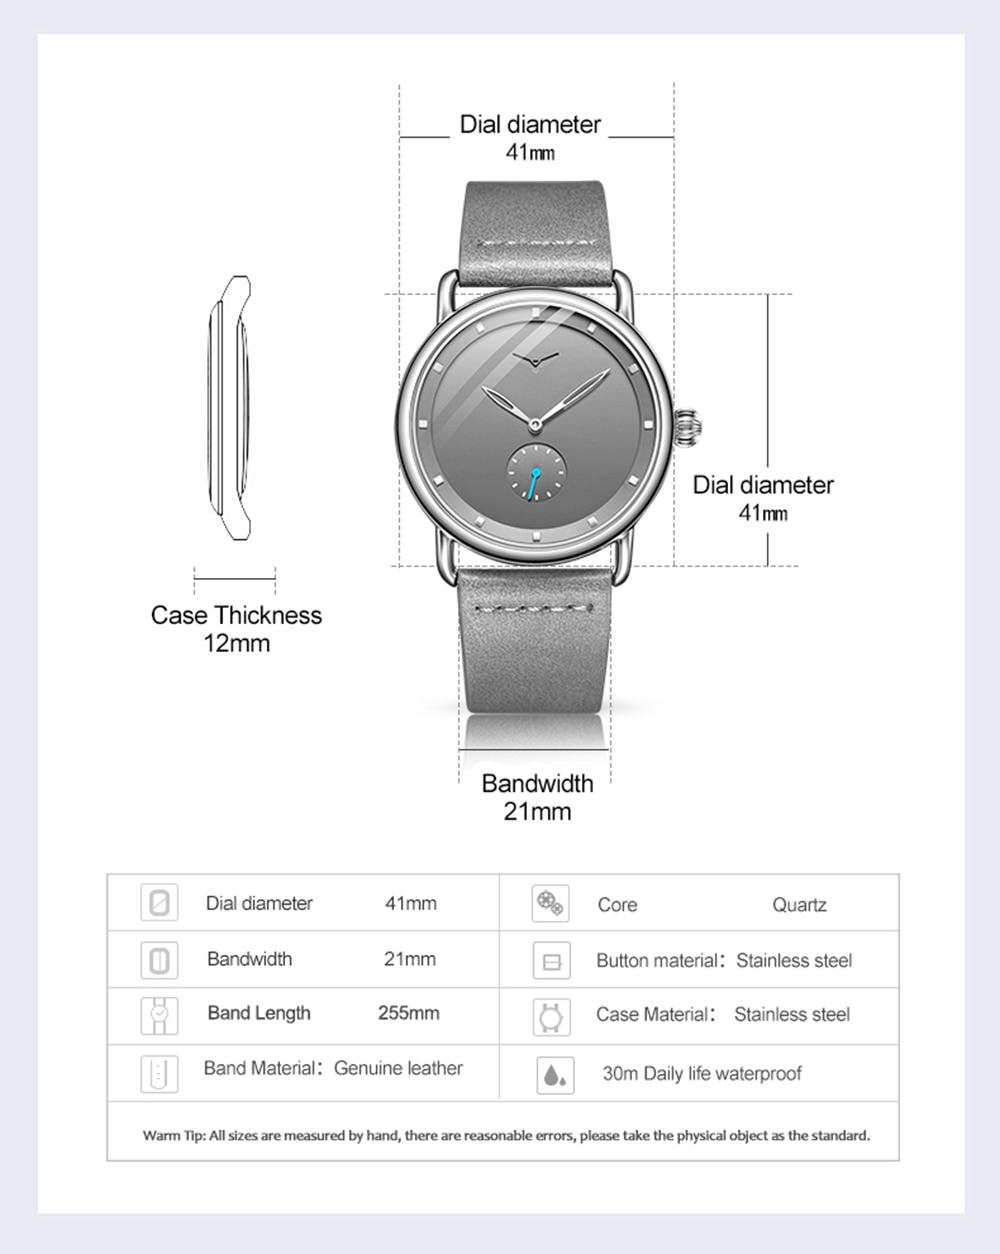 H0df2566aed4a495a88608033c661477fU ONOLA top brand leather men watches clock fashion sport simple casual waterproof Wrist watch men relogio masculino